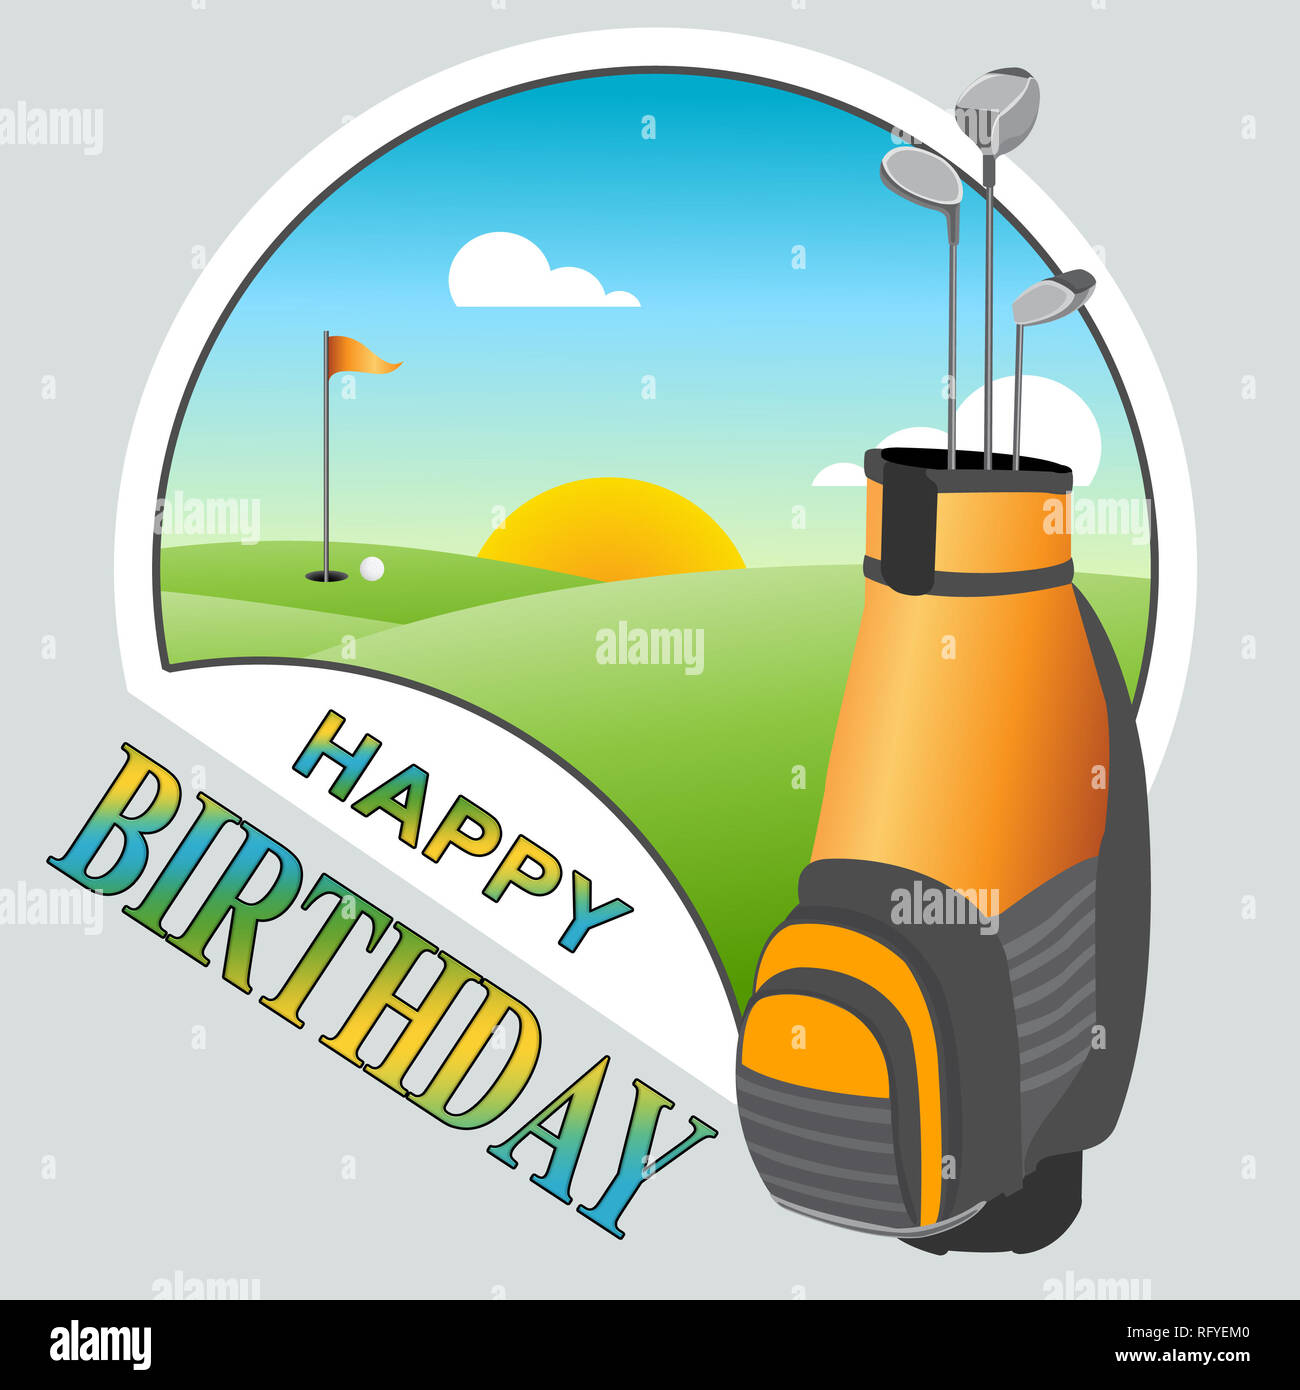 Happy Birthday Golf Nachricht Als Uberraschung Gruss Fur Golfspieler Congrats Fur Golffanatiker 3d Darstellung Stockfotografie Alamy